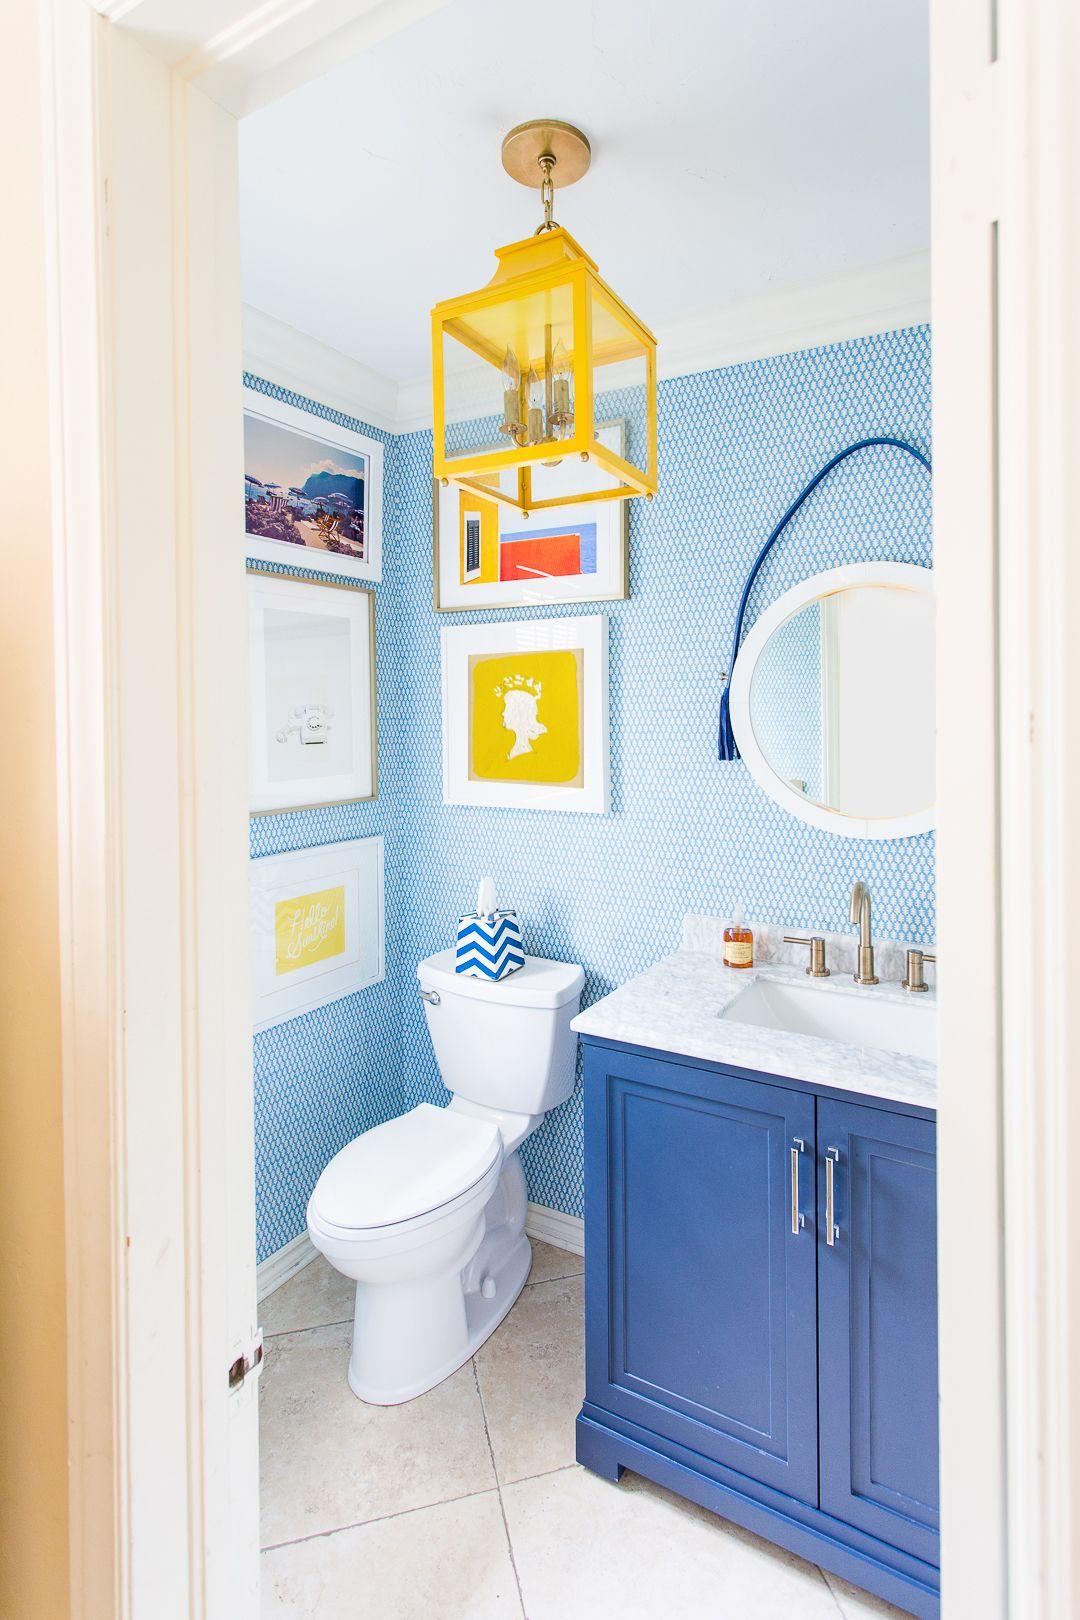 Powder Bathroom Reveal With Images Kid Bathroom Decor